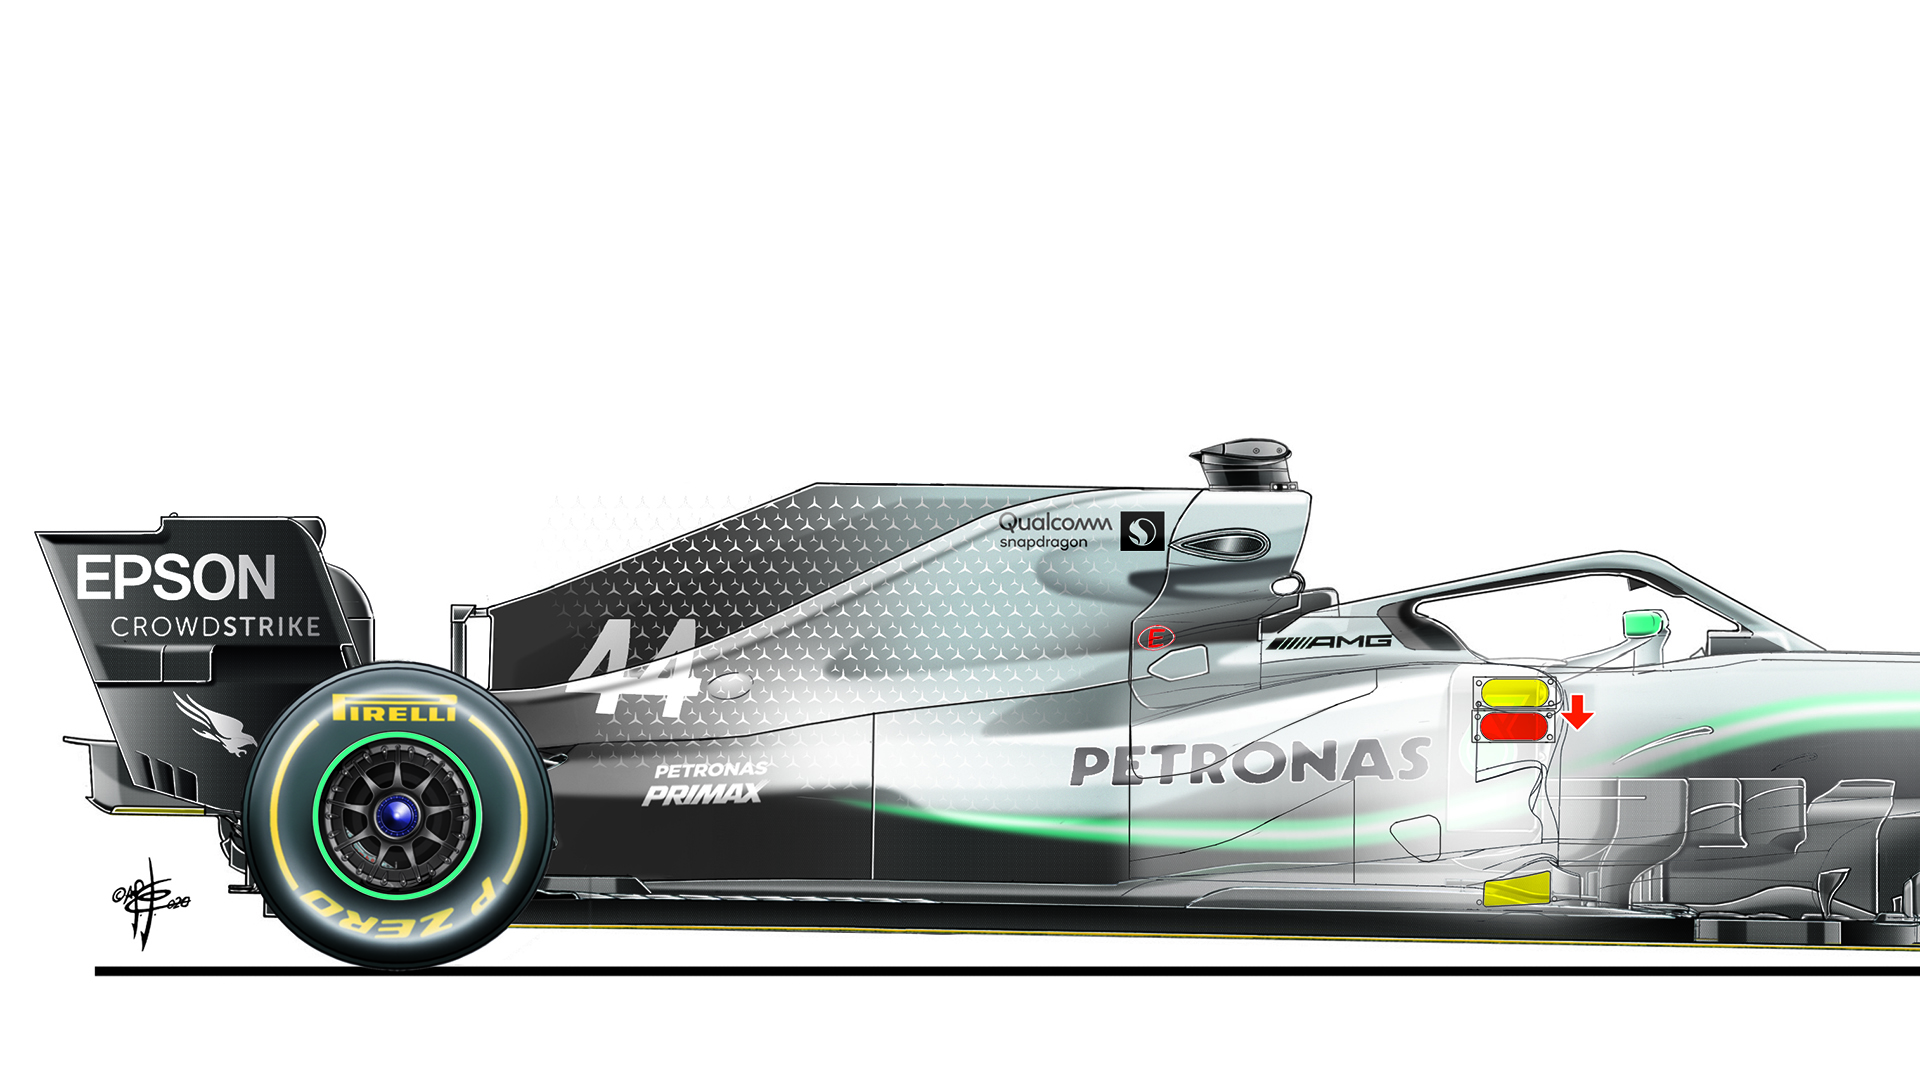 Tech Insight How A Ferrari Like Sidepod Tweak Could Help Mercedes Go Even Faster In 2020 Formula 1